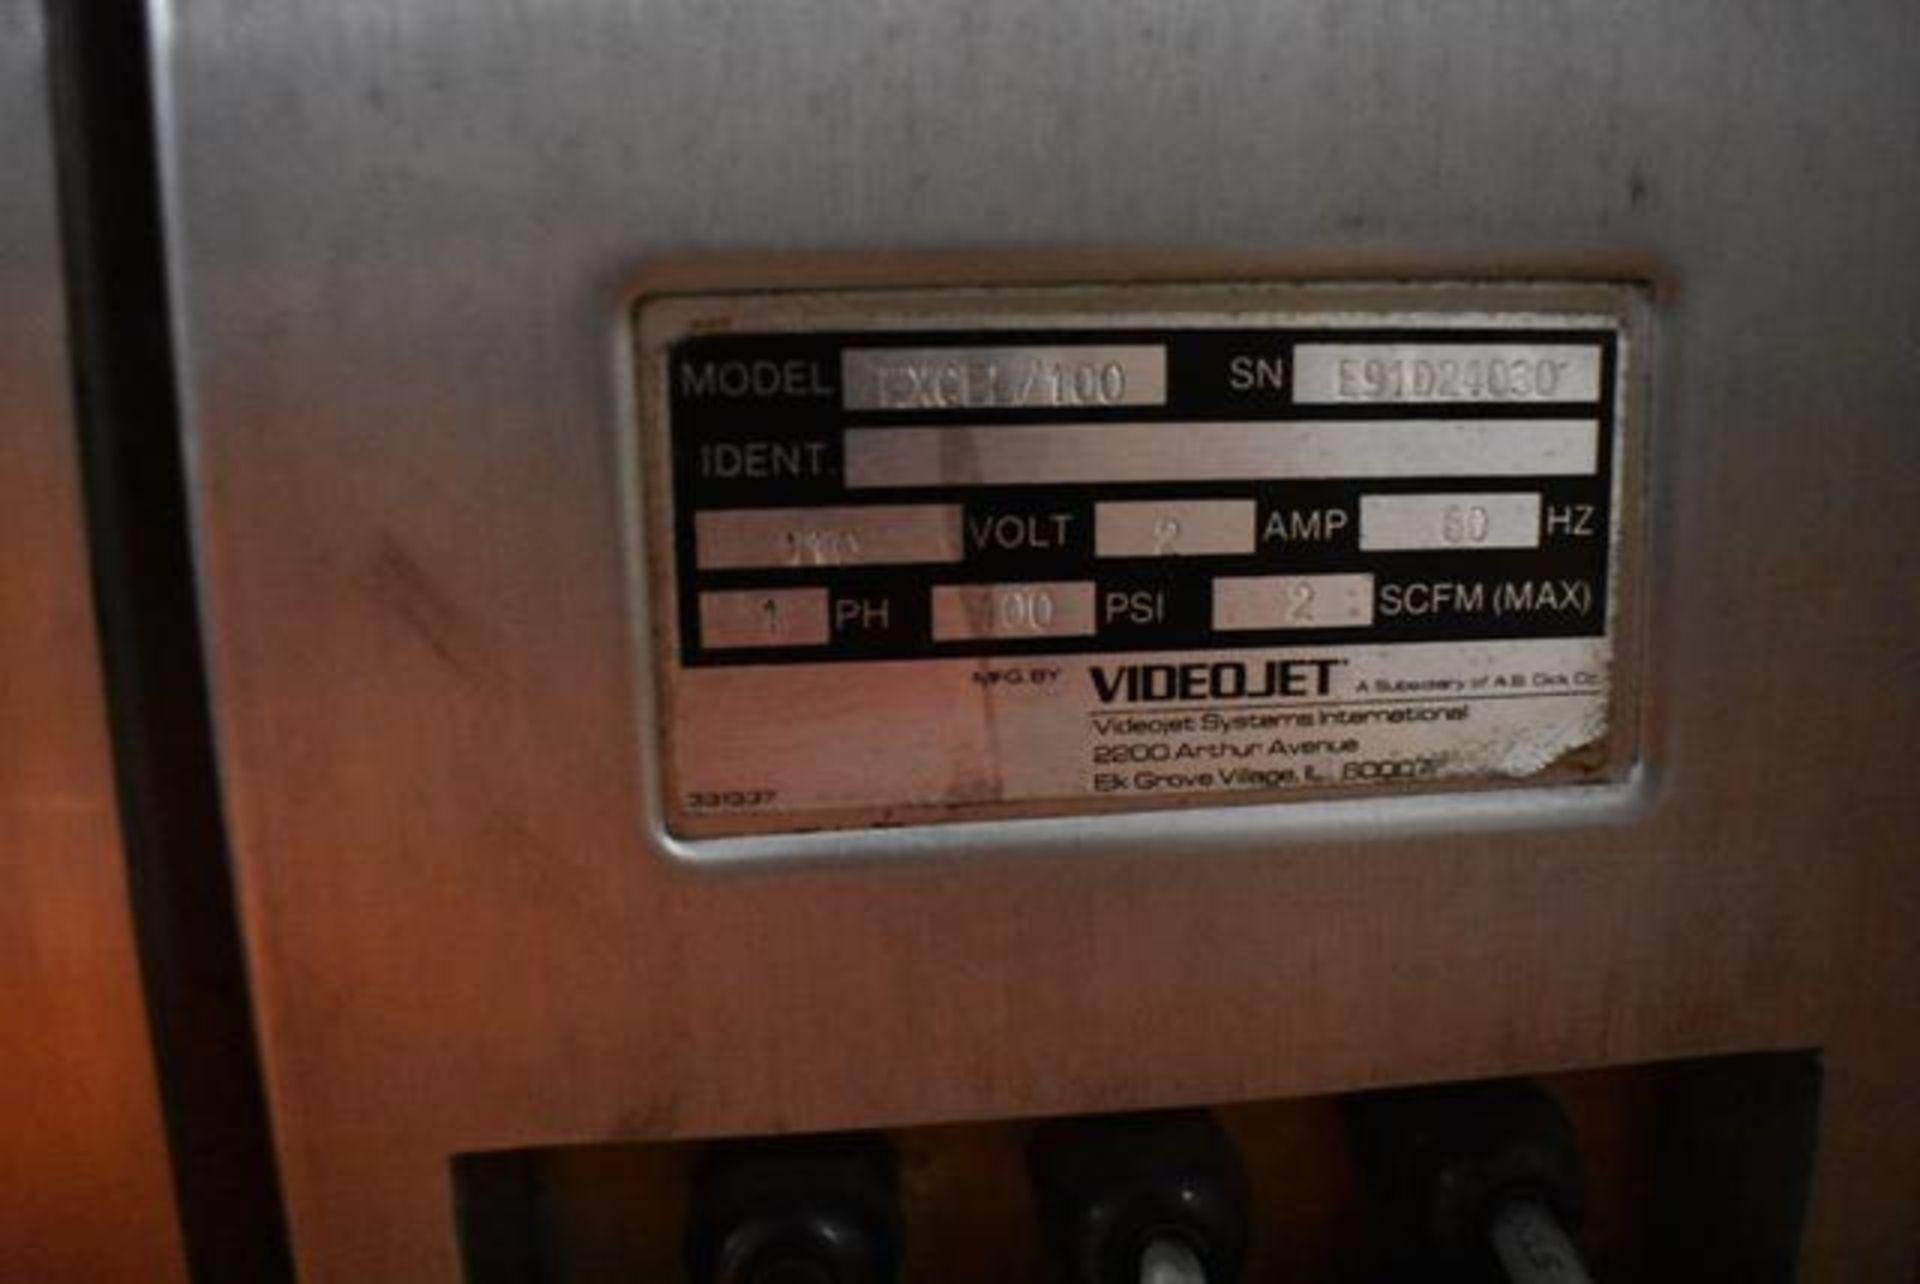 Lot 216 - VideoJet Excel Series 100 Includes Base, Loading Fee: $50